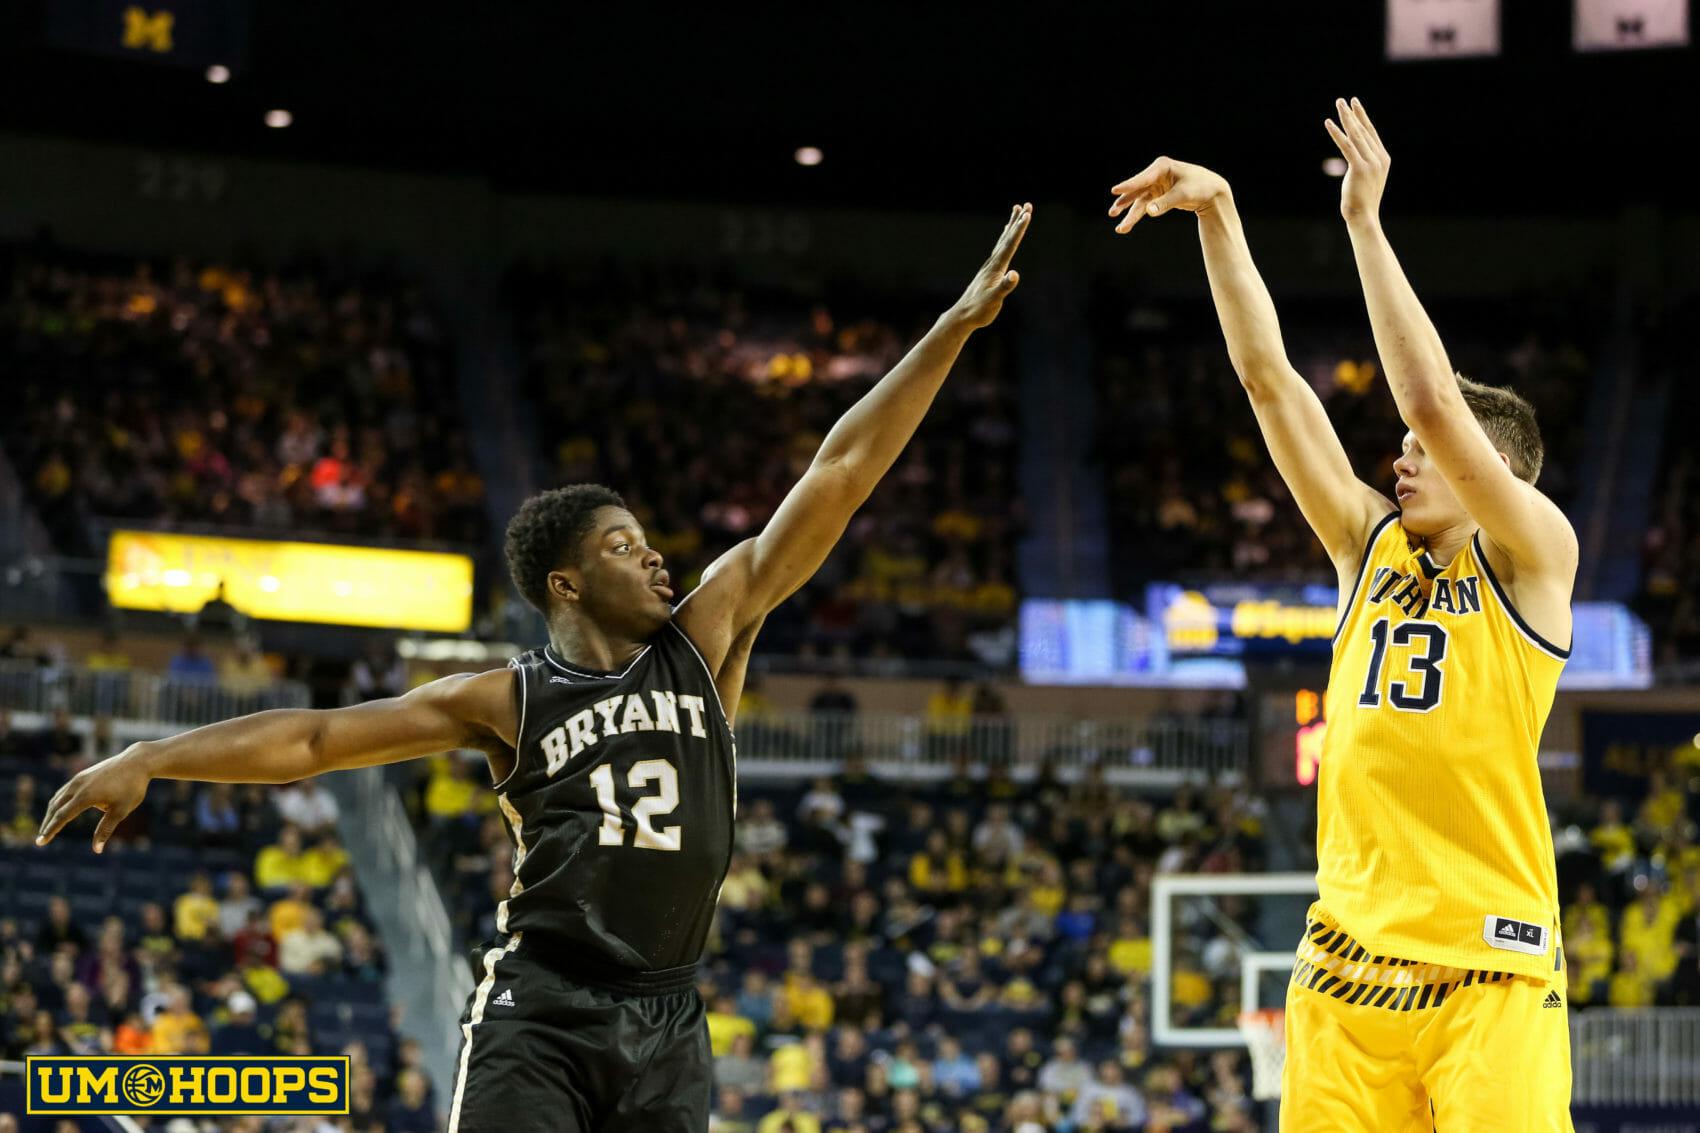 Michigan 96, Bryant 60-29